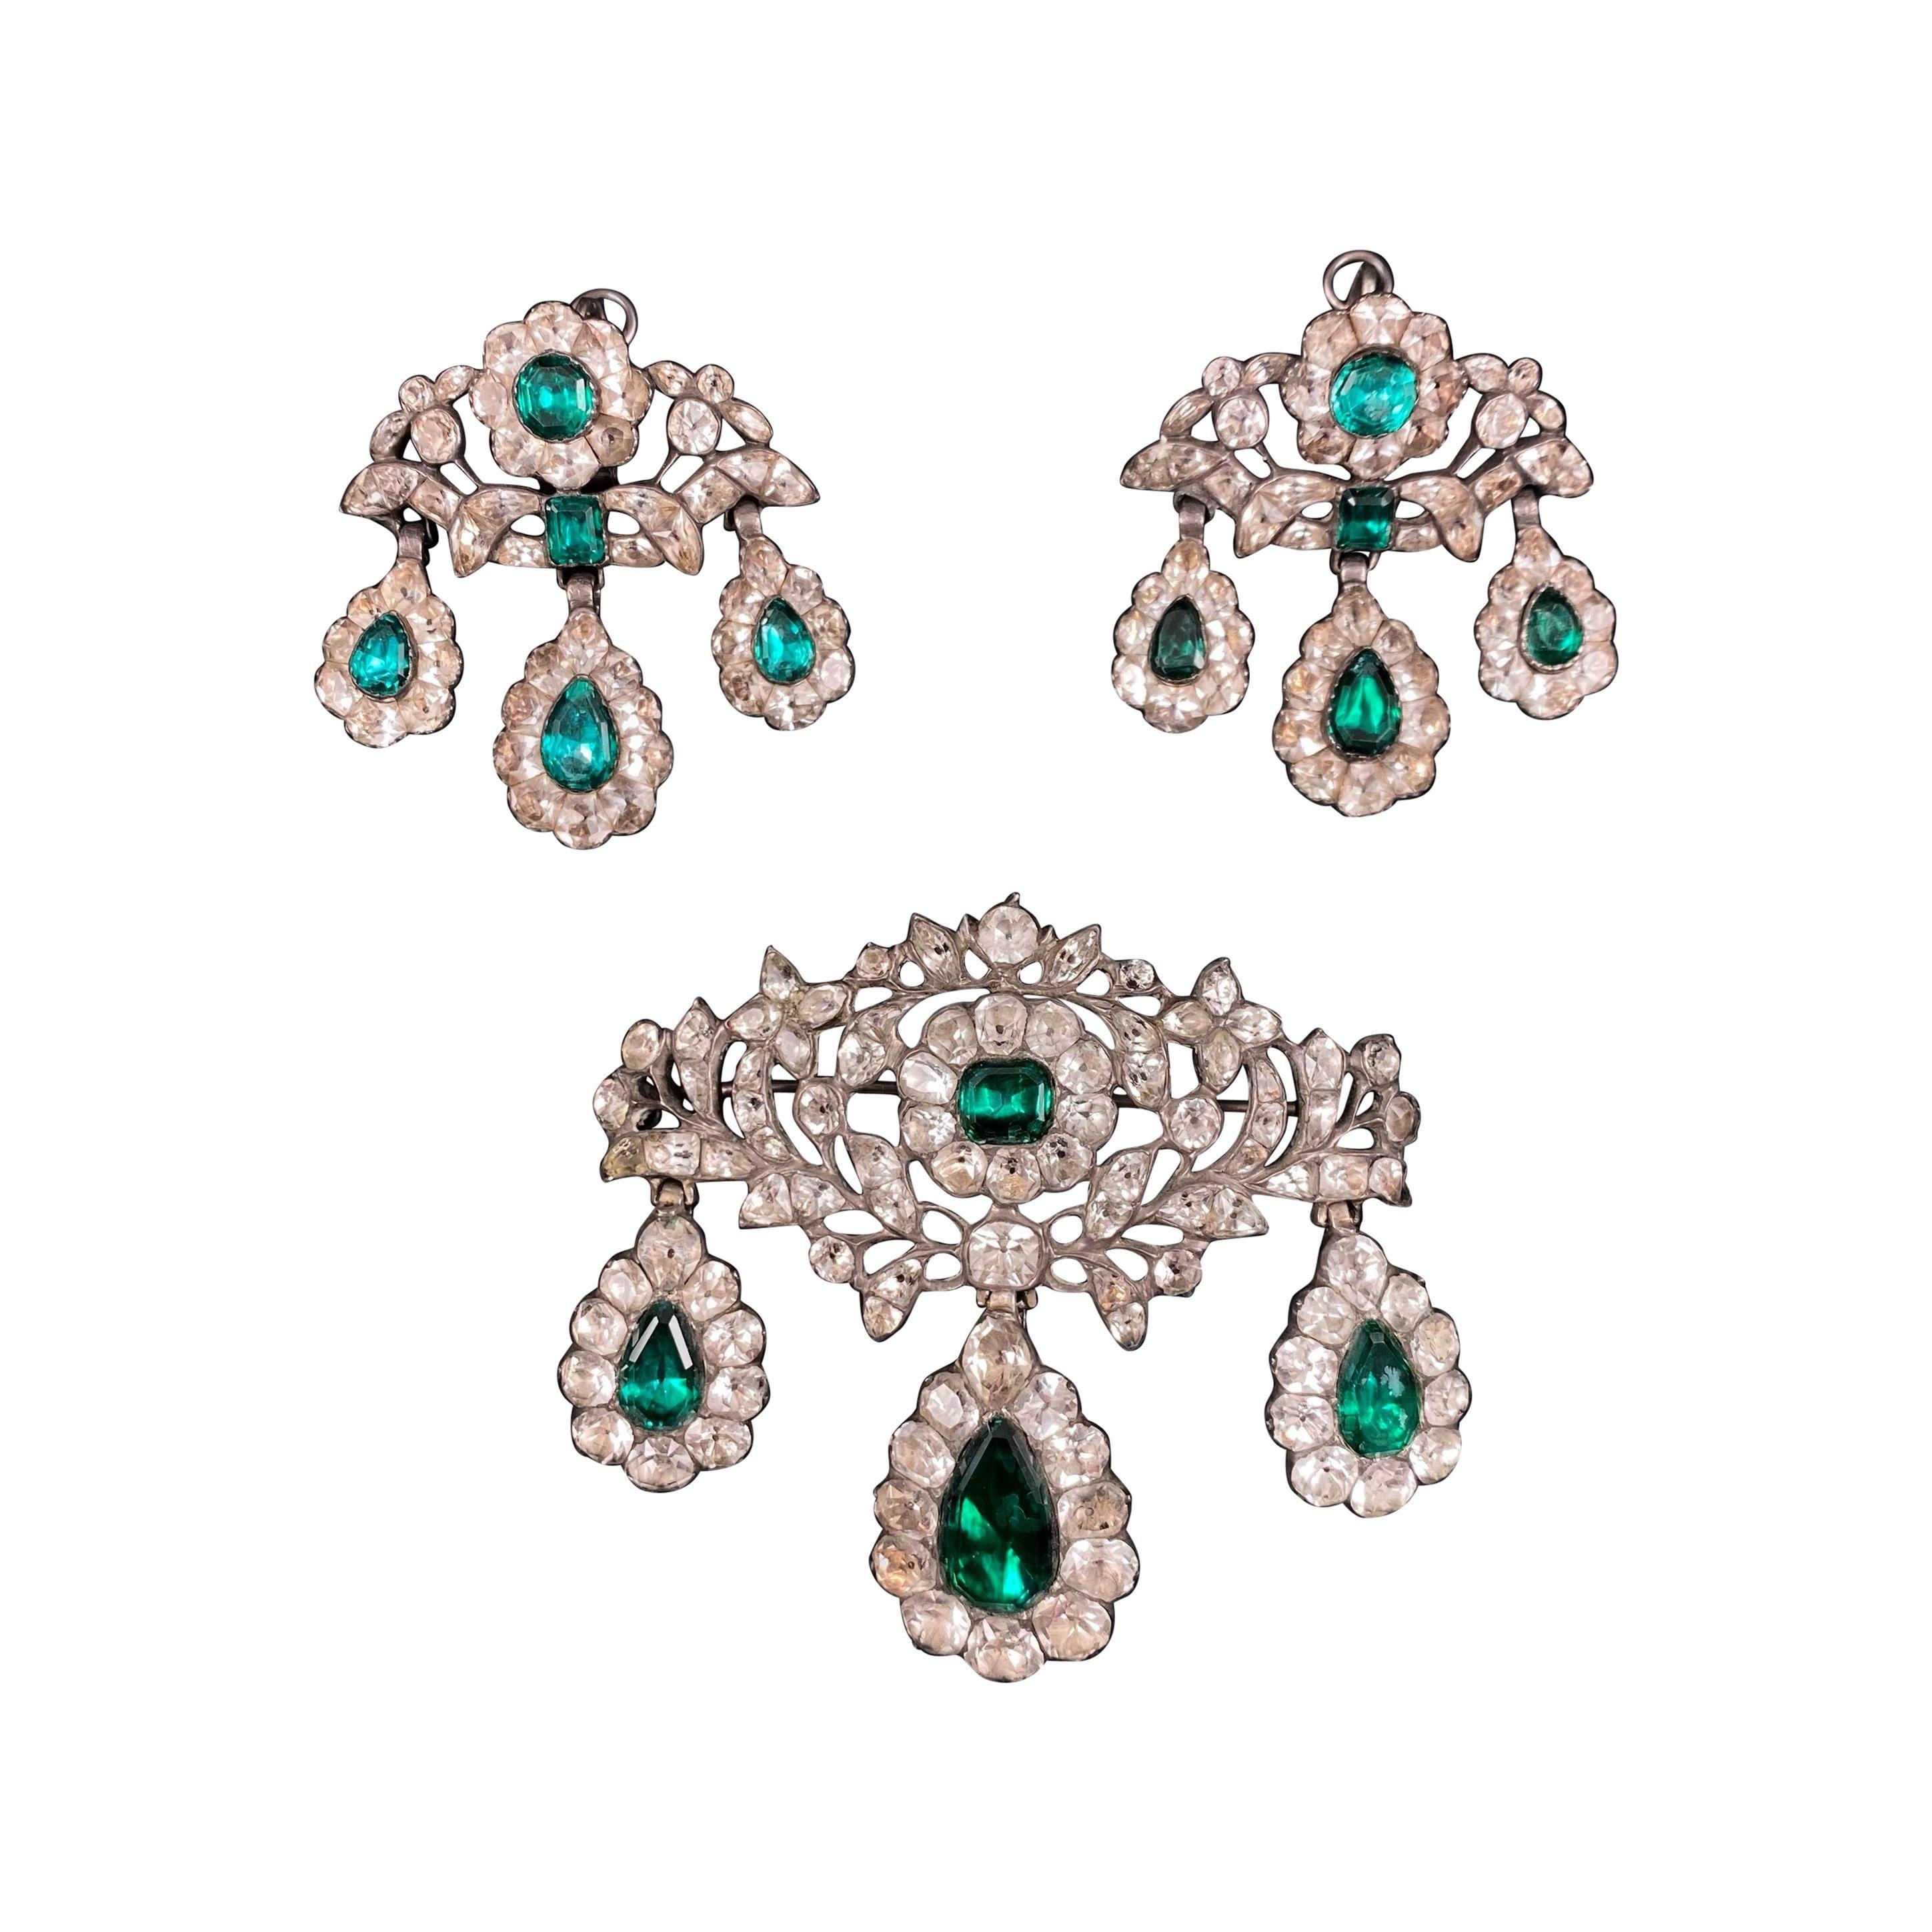 Antique 18th Century Minas Novas Rock Crystal Topaz Girandole Earrings Brooch